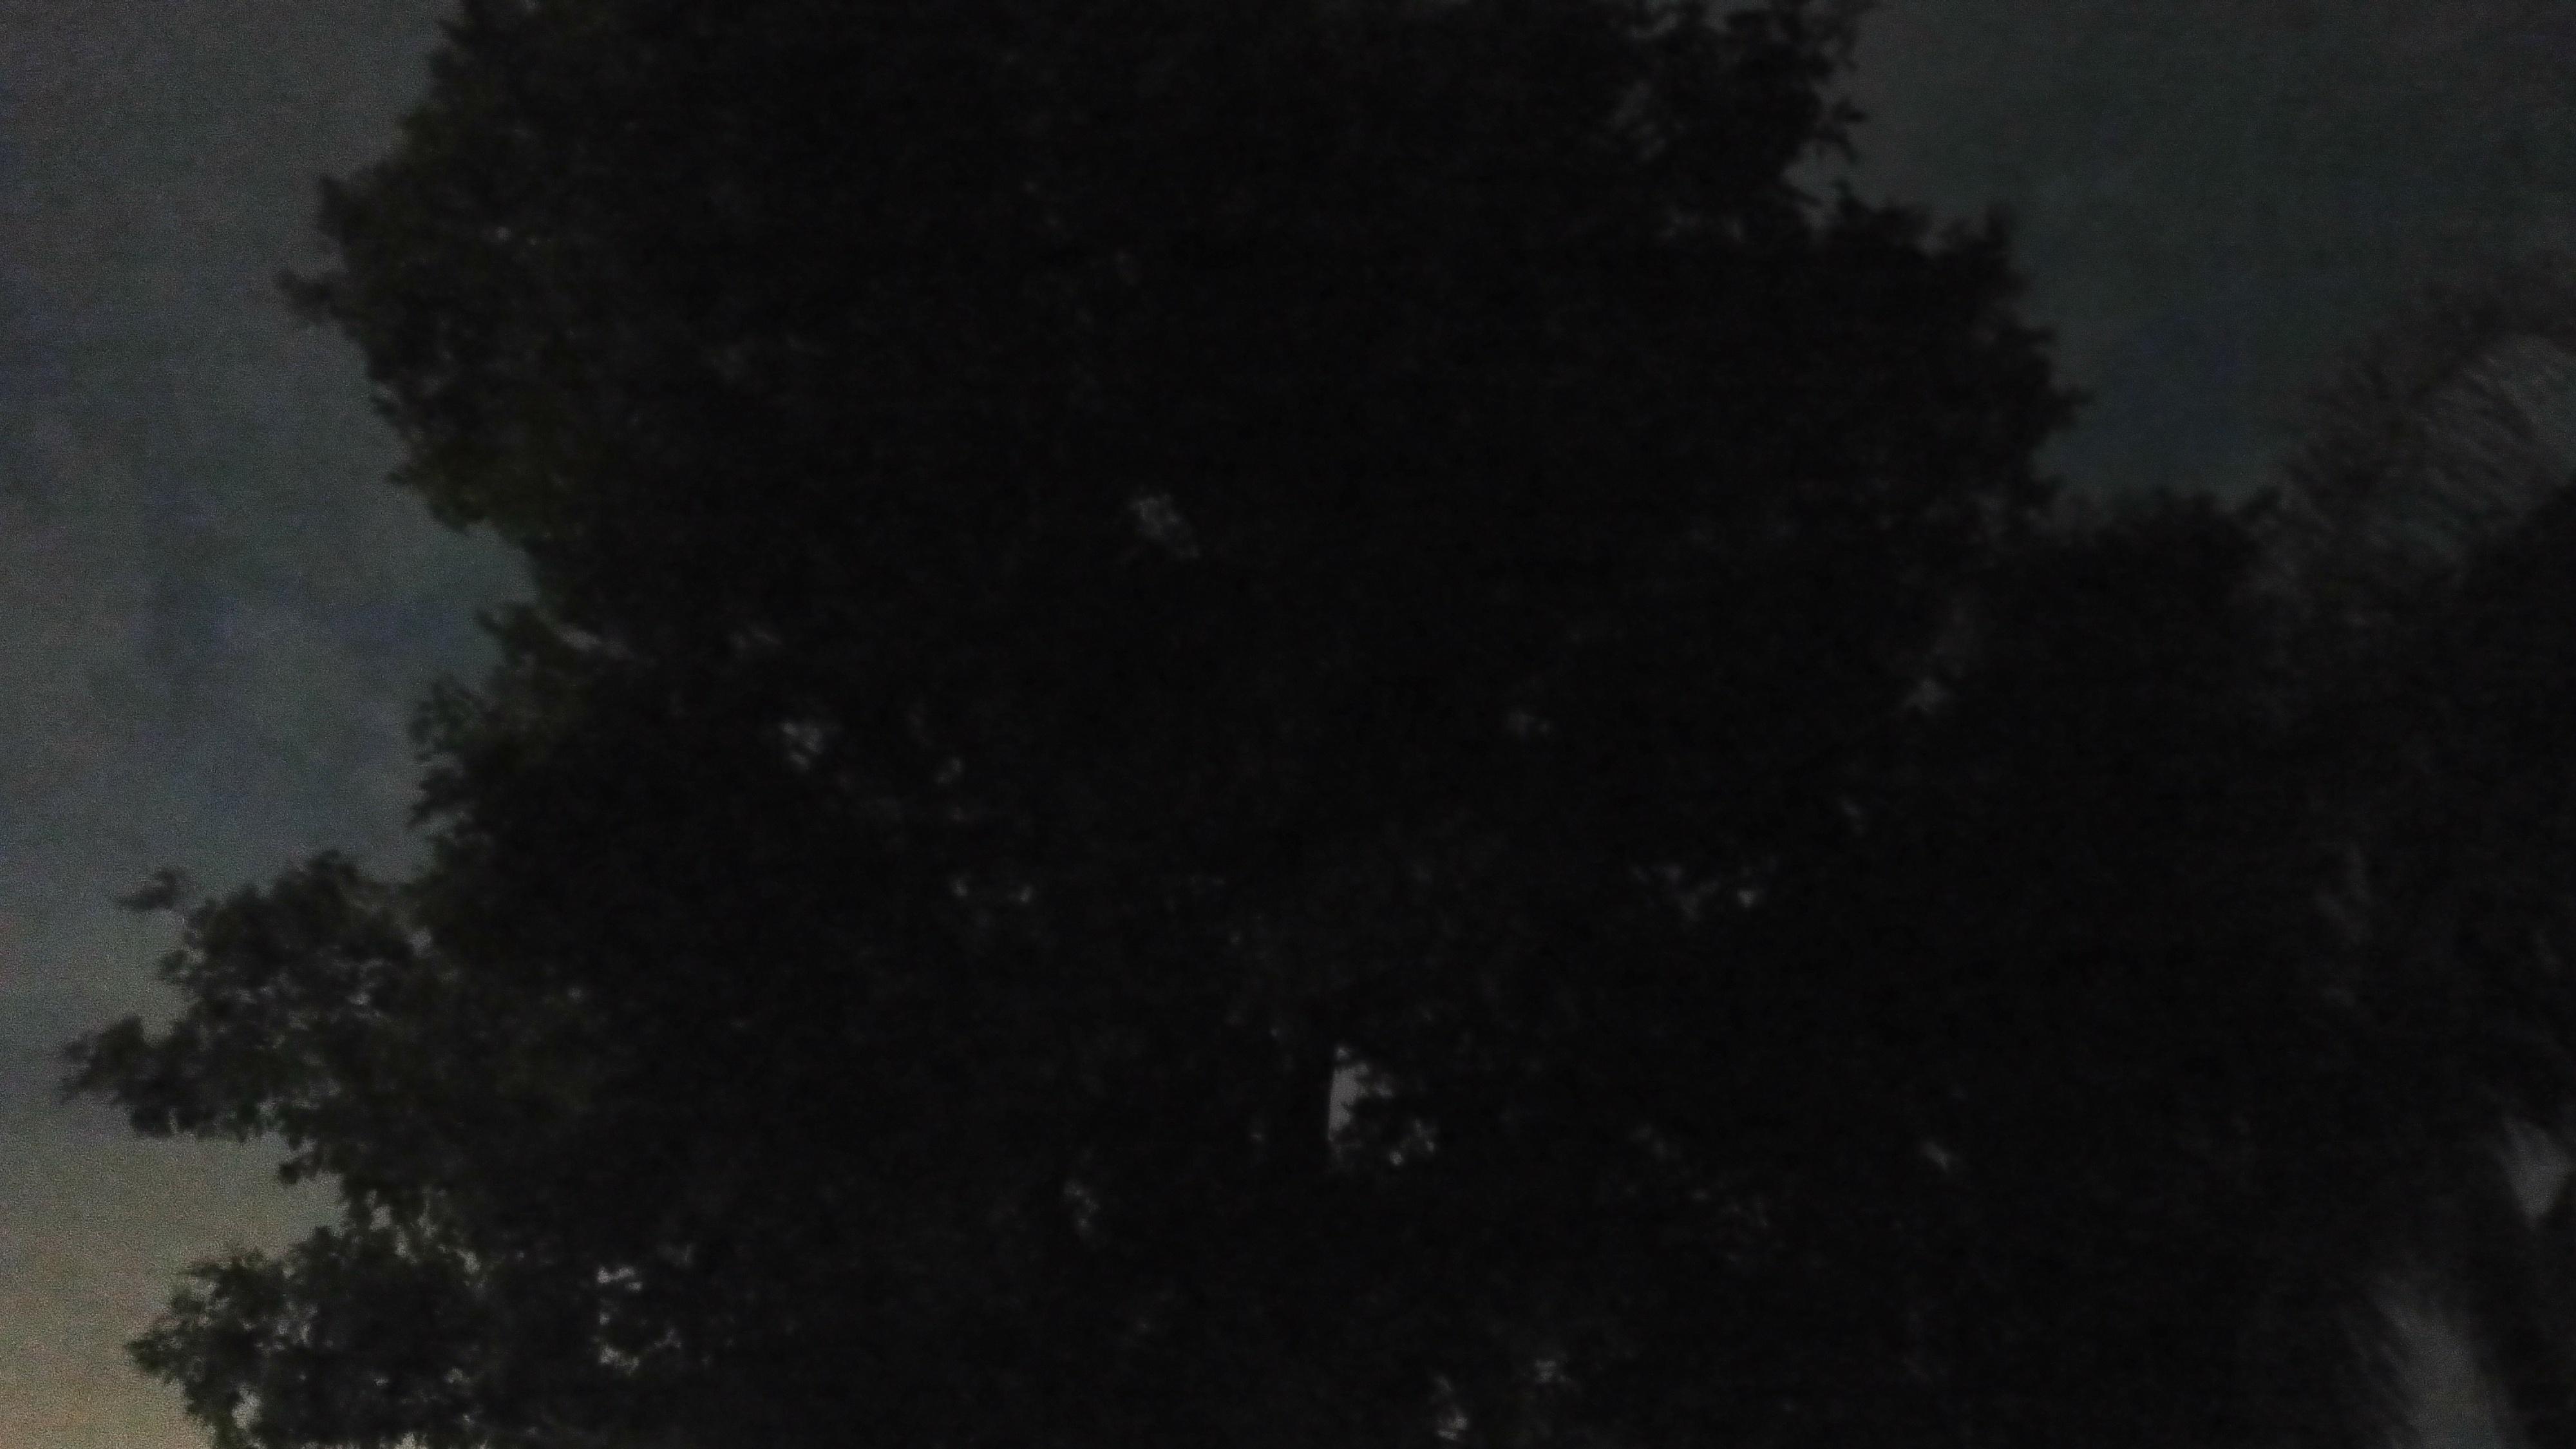 Motorola Edge 20 Fusion Night Mode camera samples